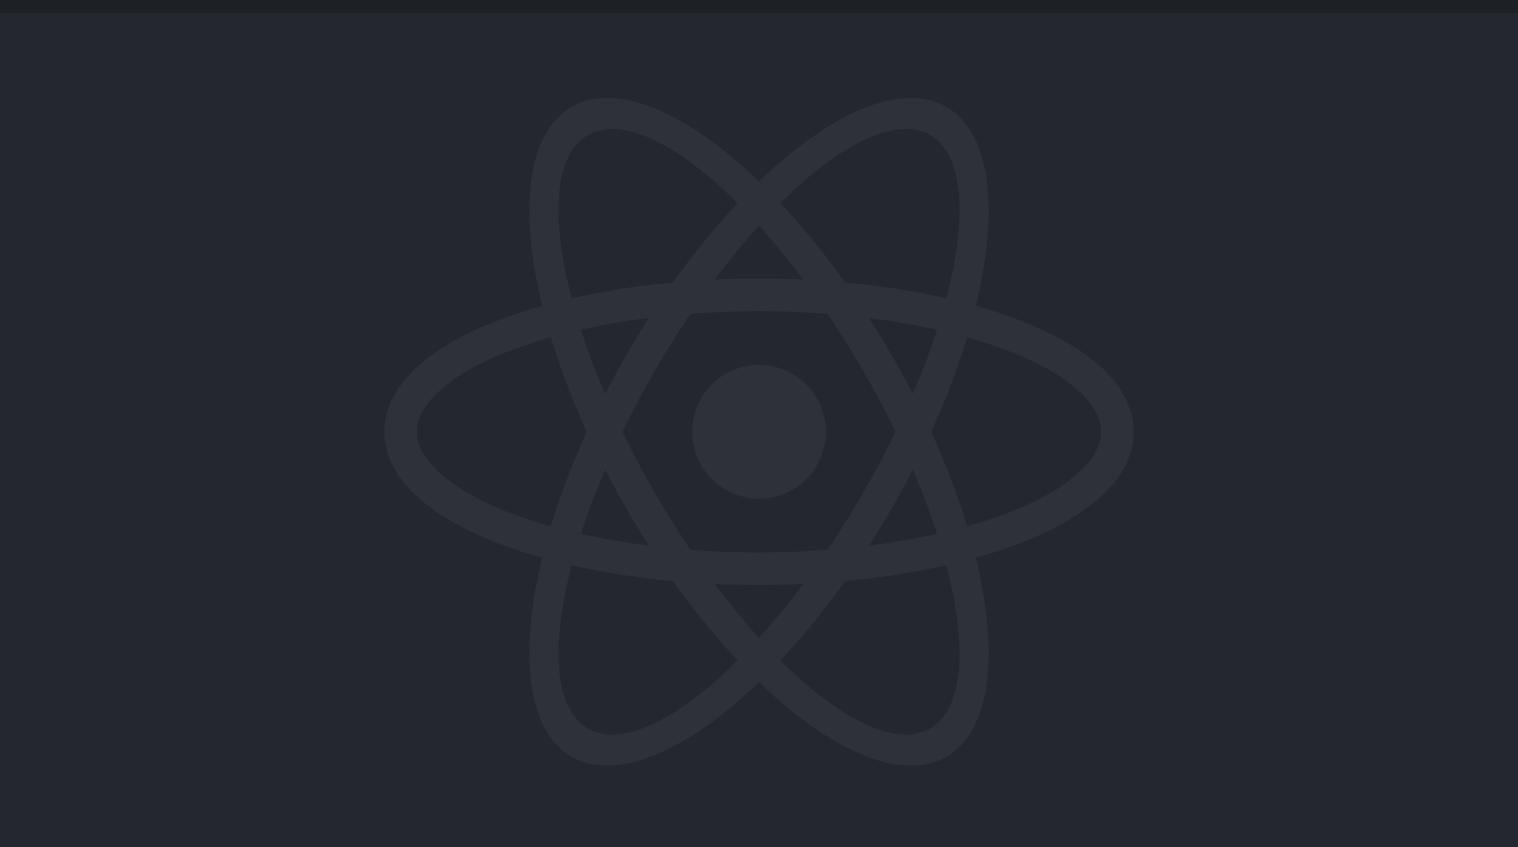 React background